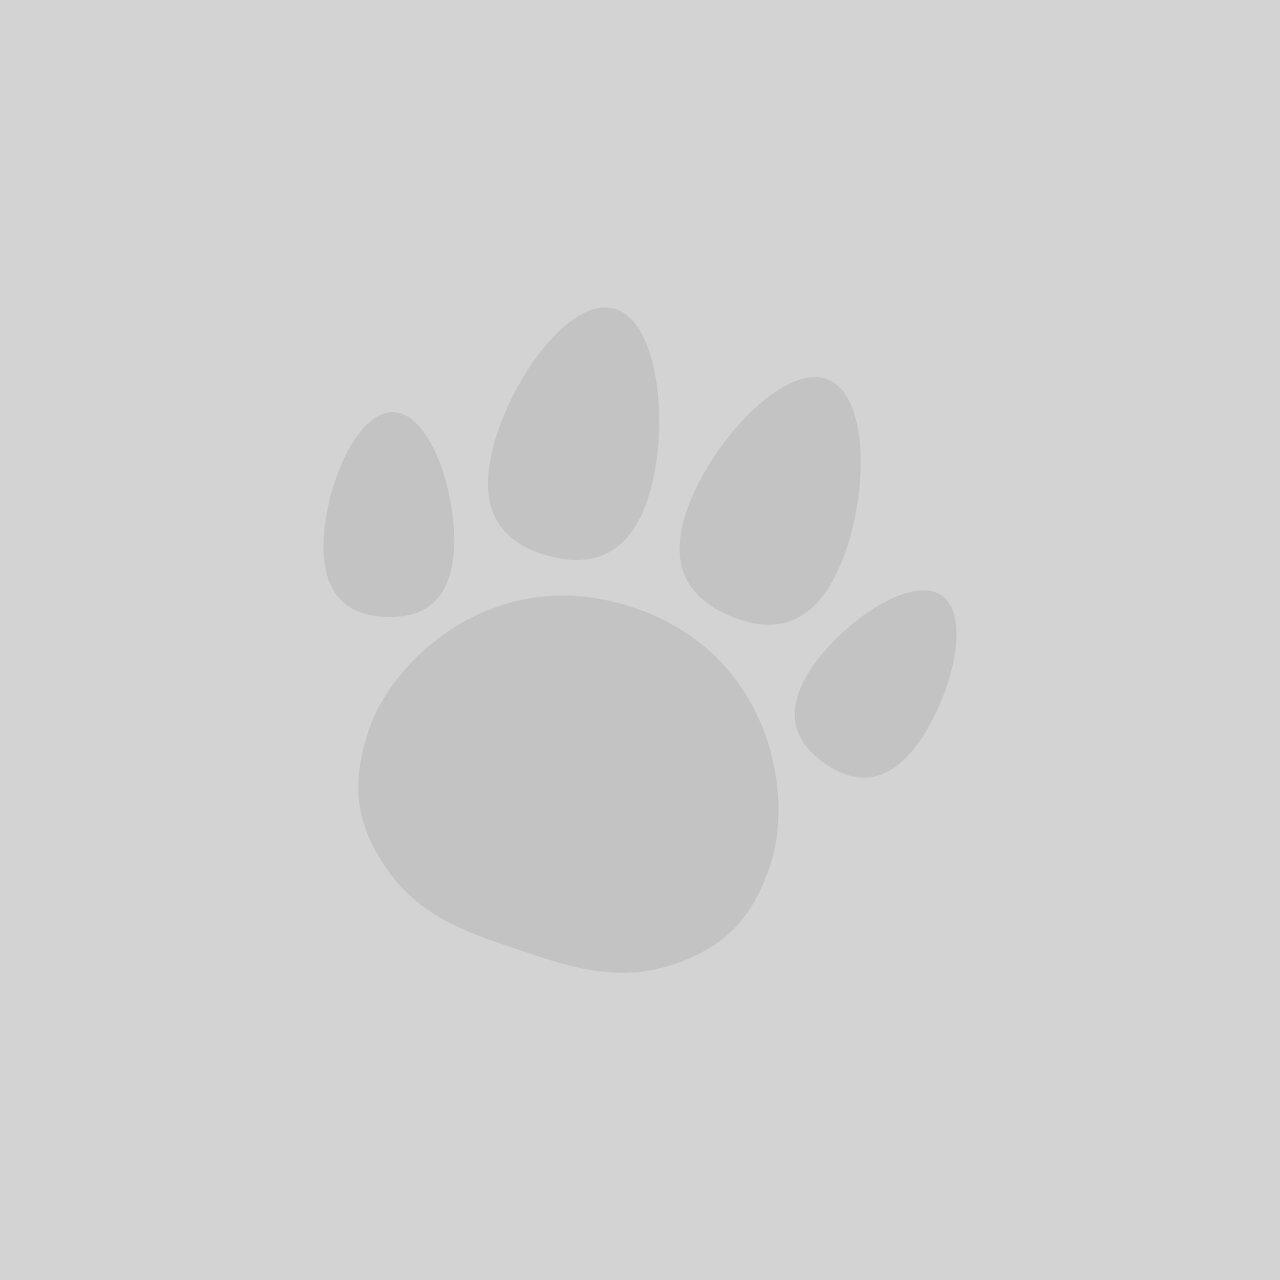 Ancol Nylon Dog Lead 1mx25mm (3 Colour Options)